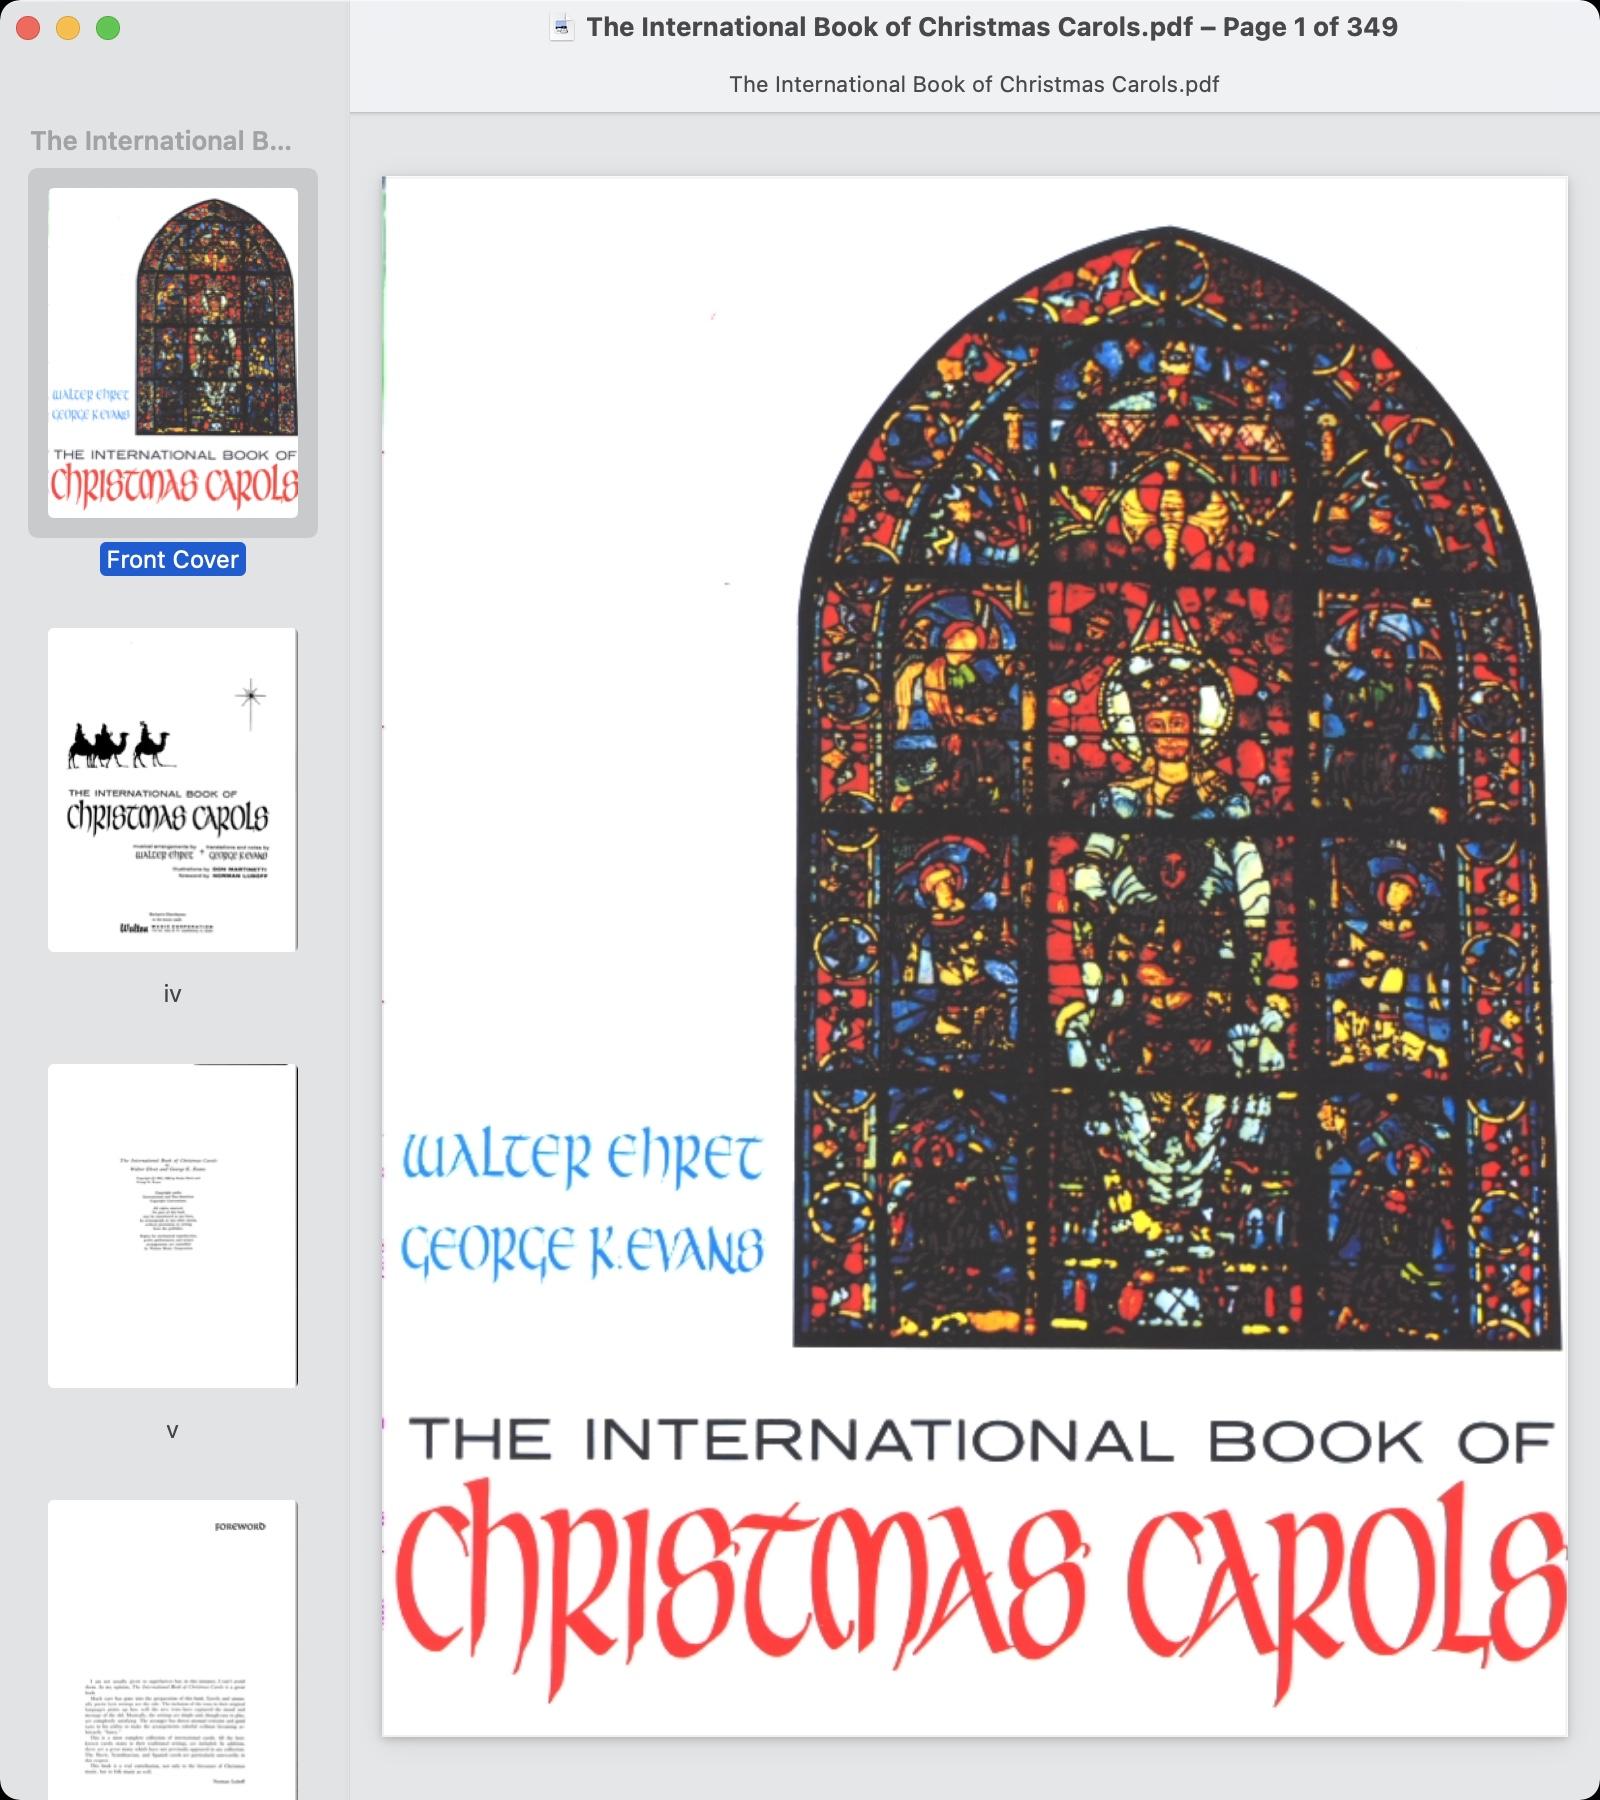 The International Book of Christmas Carols.jpg